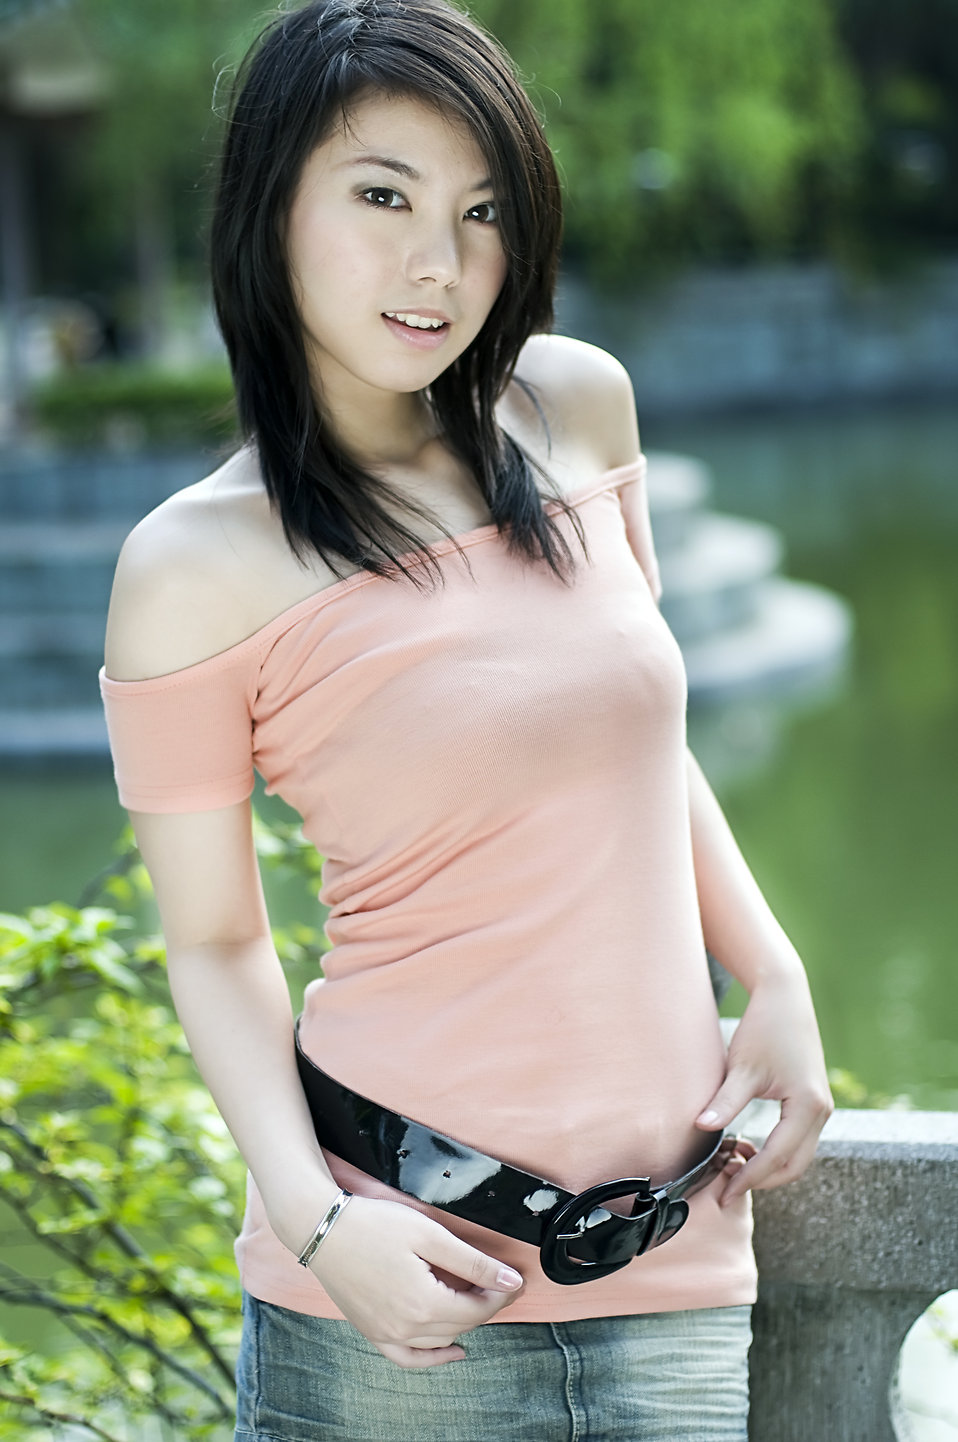 nude girls Free chinese